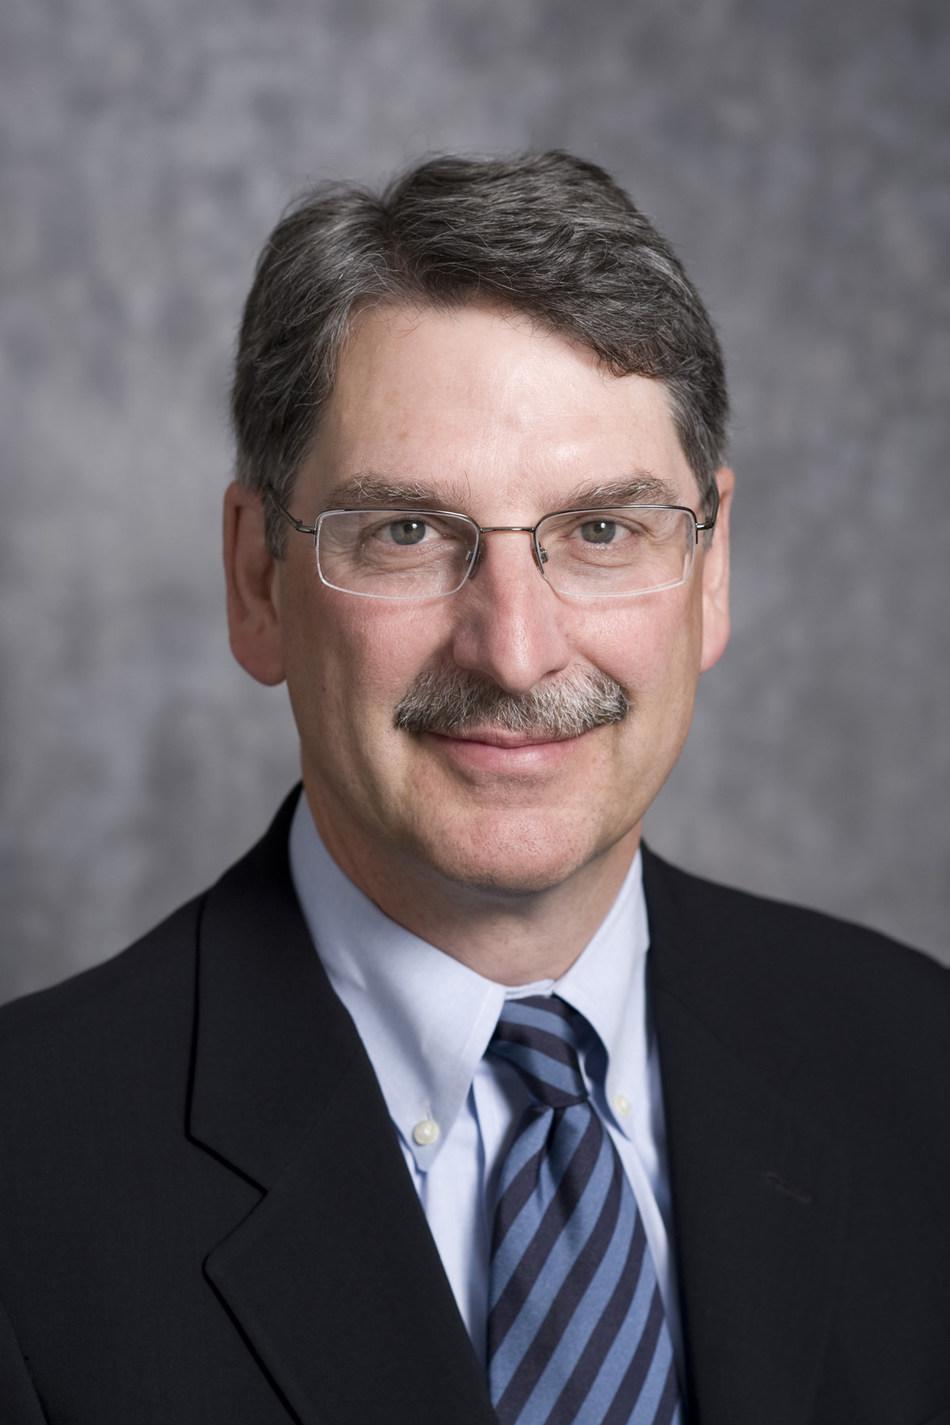 Peter Grua, Oceans Healthcare Board